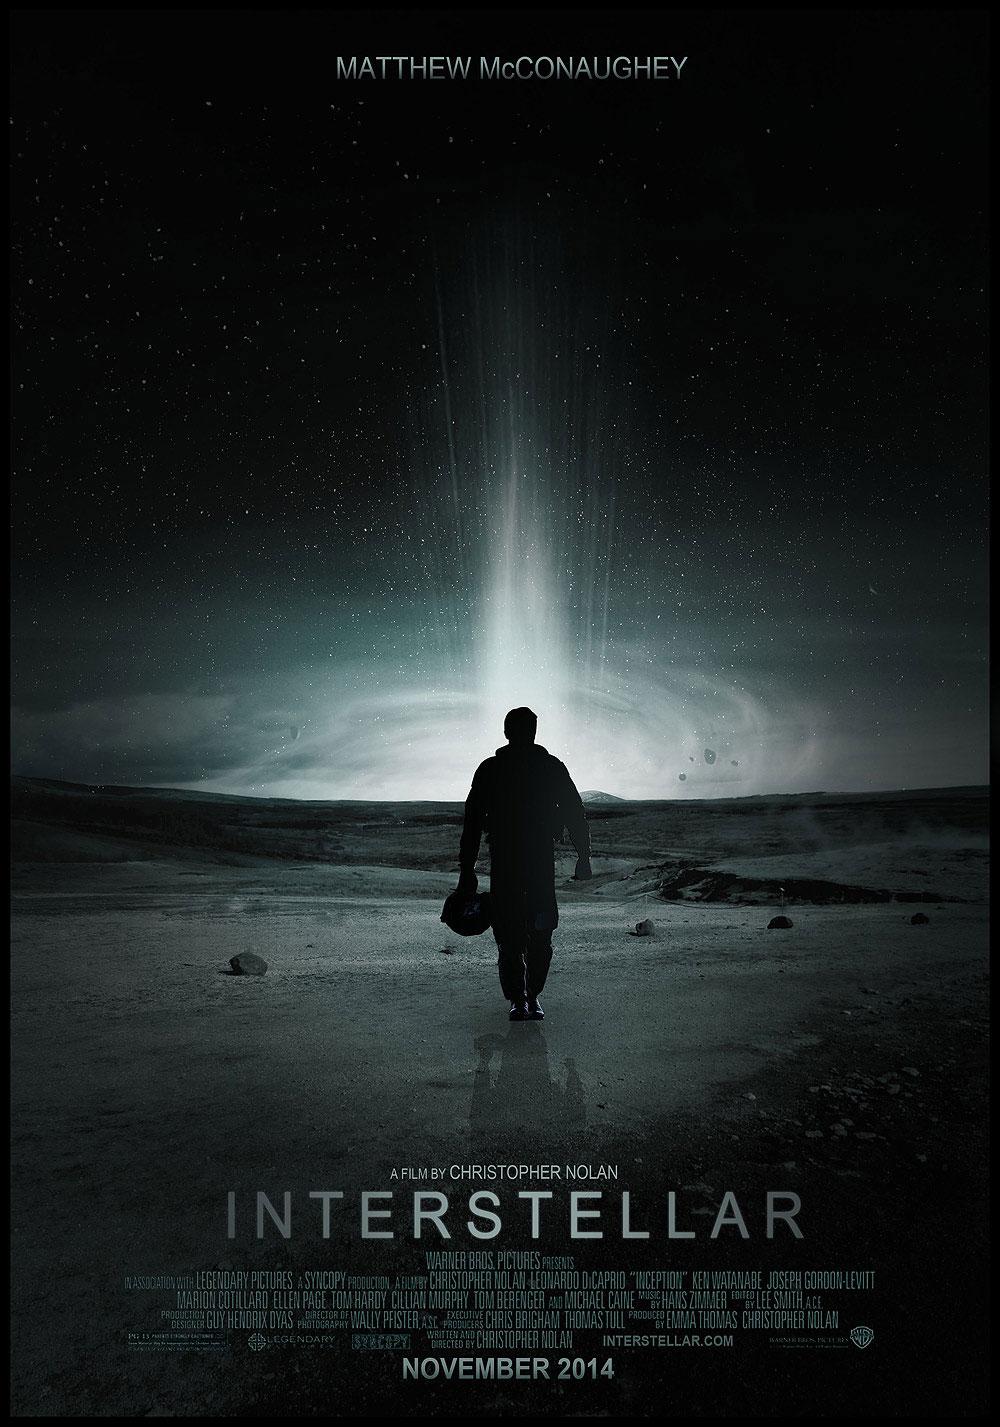 Interstellar Poster teaser